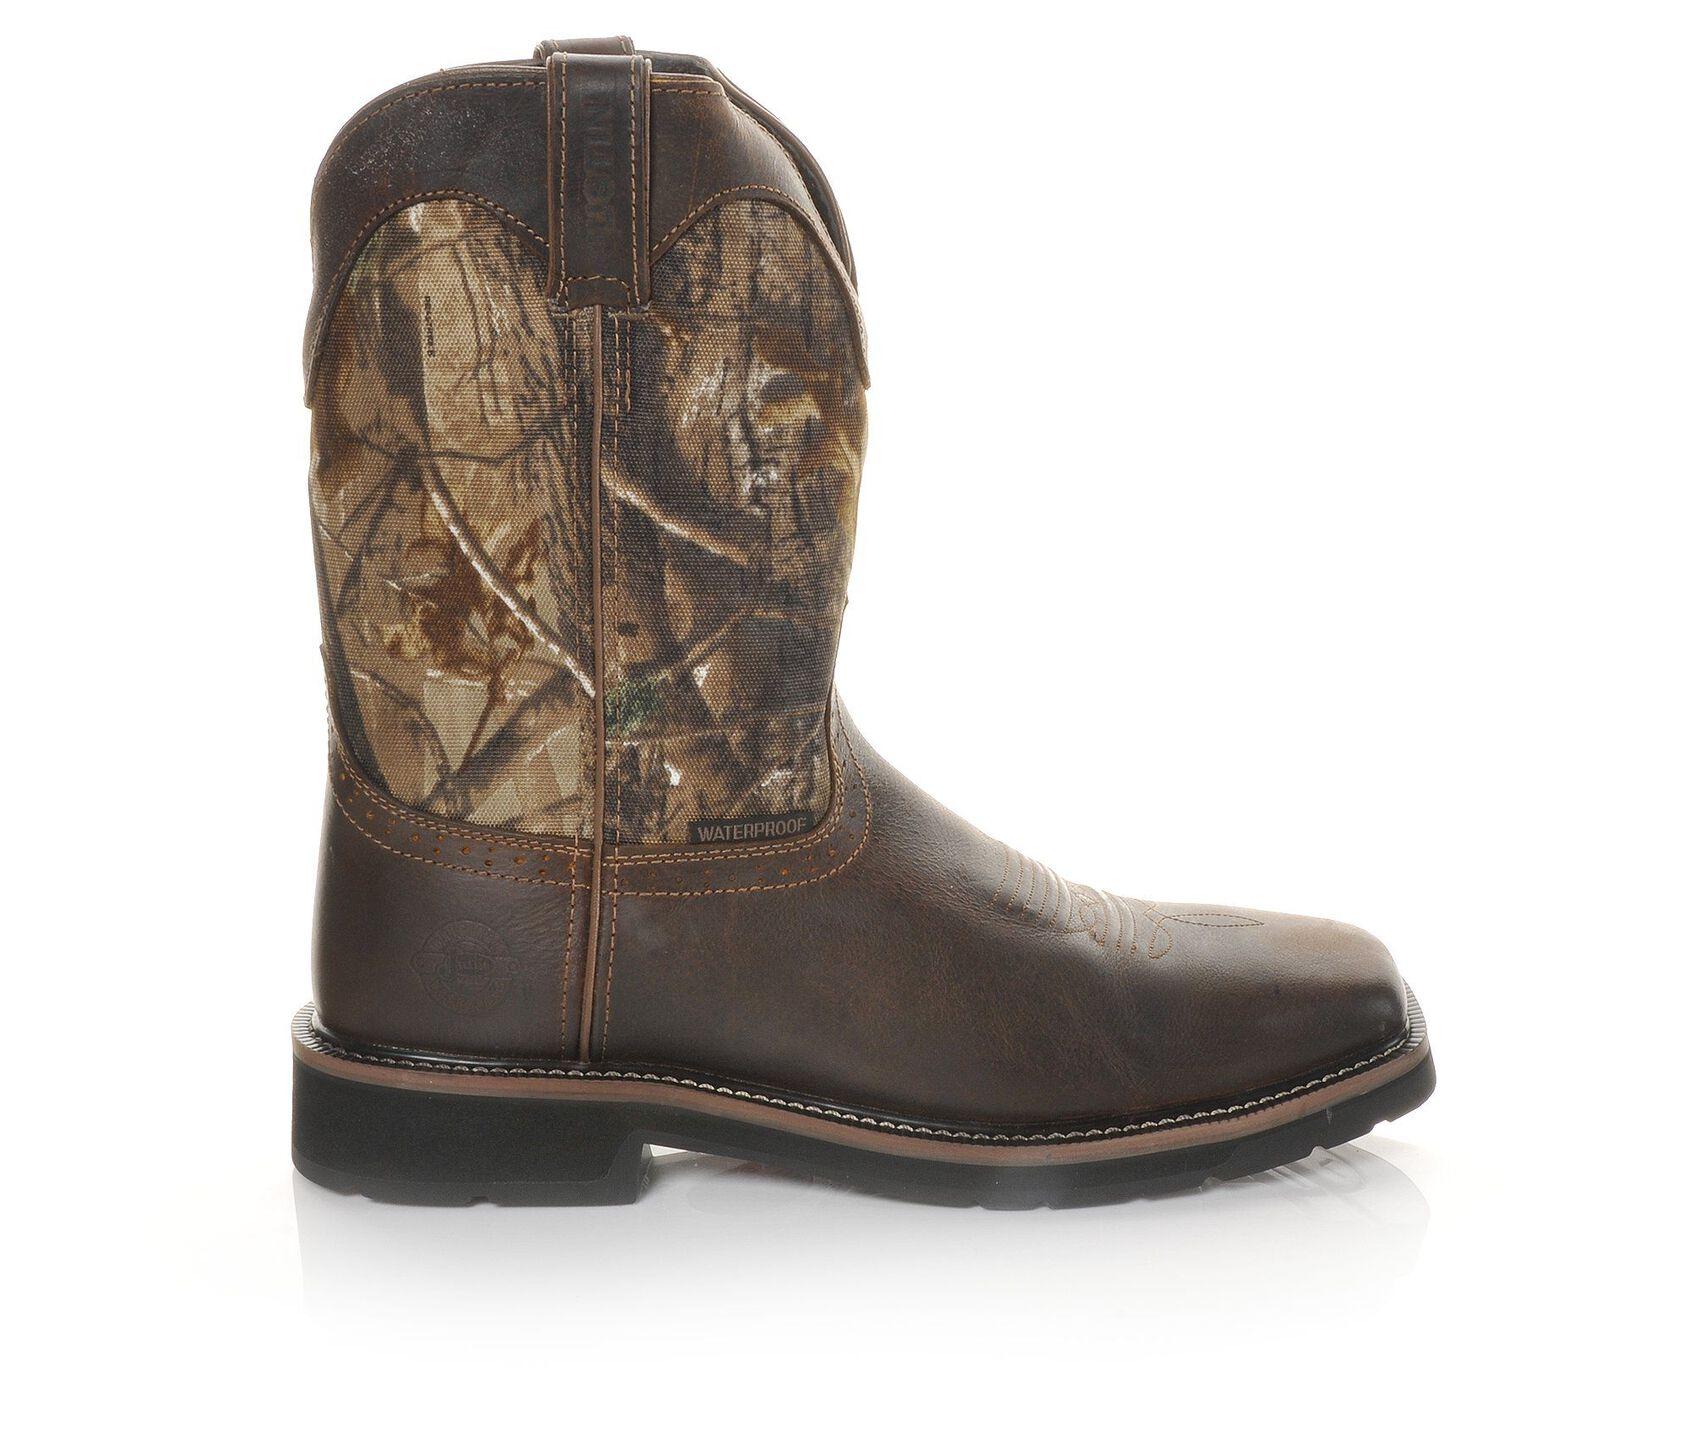 Men S Justin Boots Wk4676 Stampede Work Boots